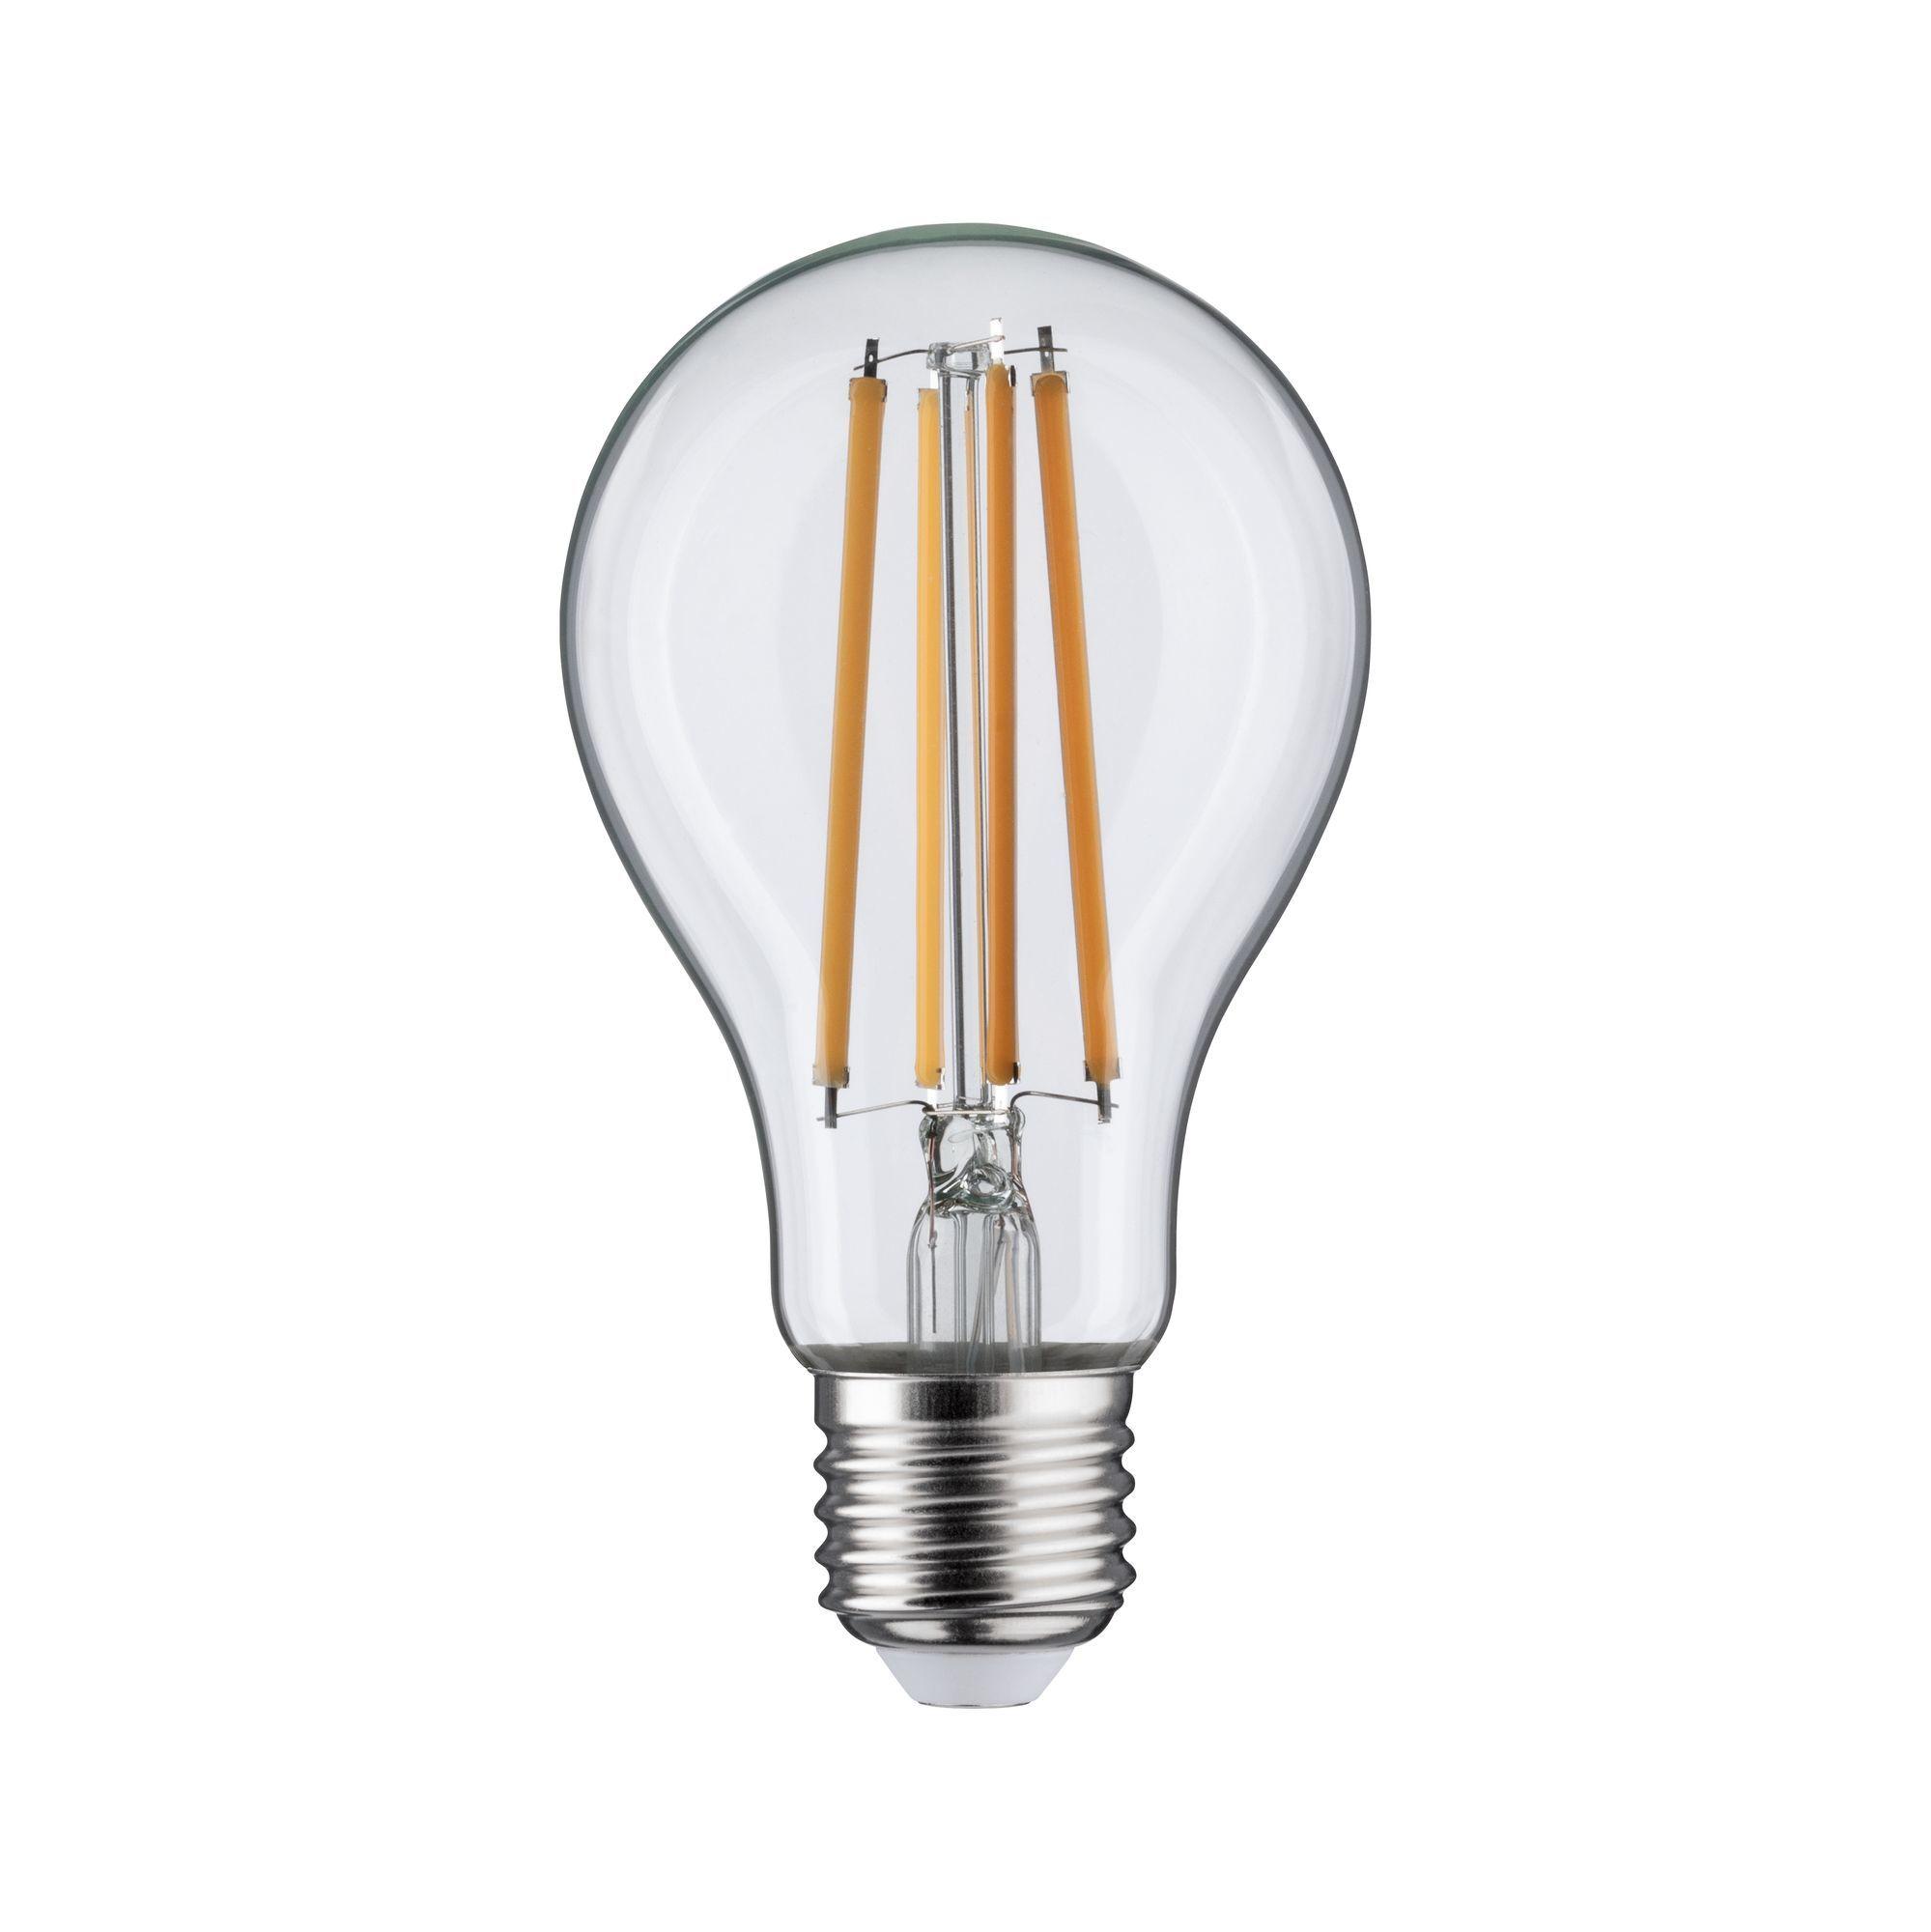 Paulmann LED Fil AGL 1521lm E27 2700K 12,5W klar dim 230V (28647)